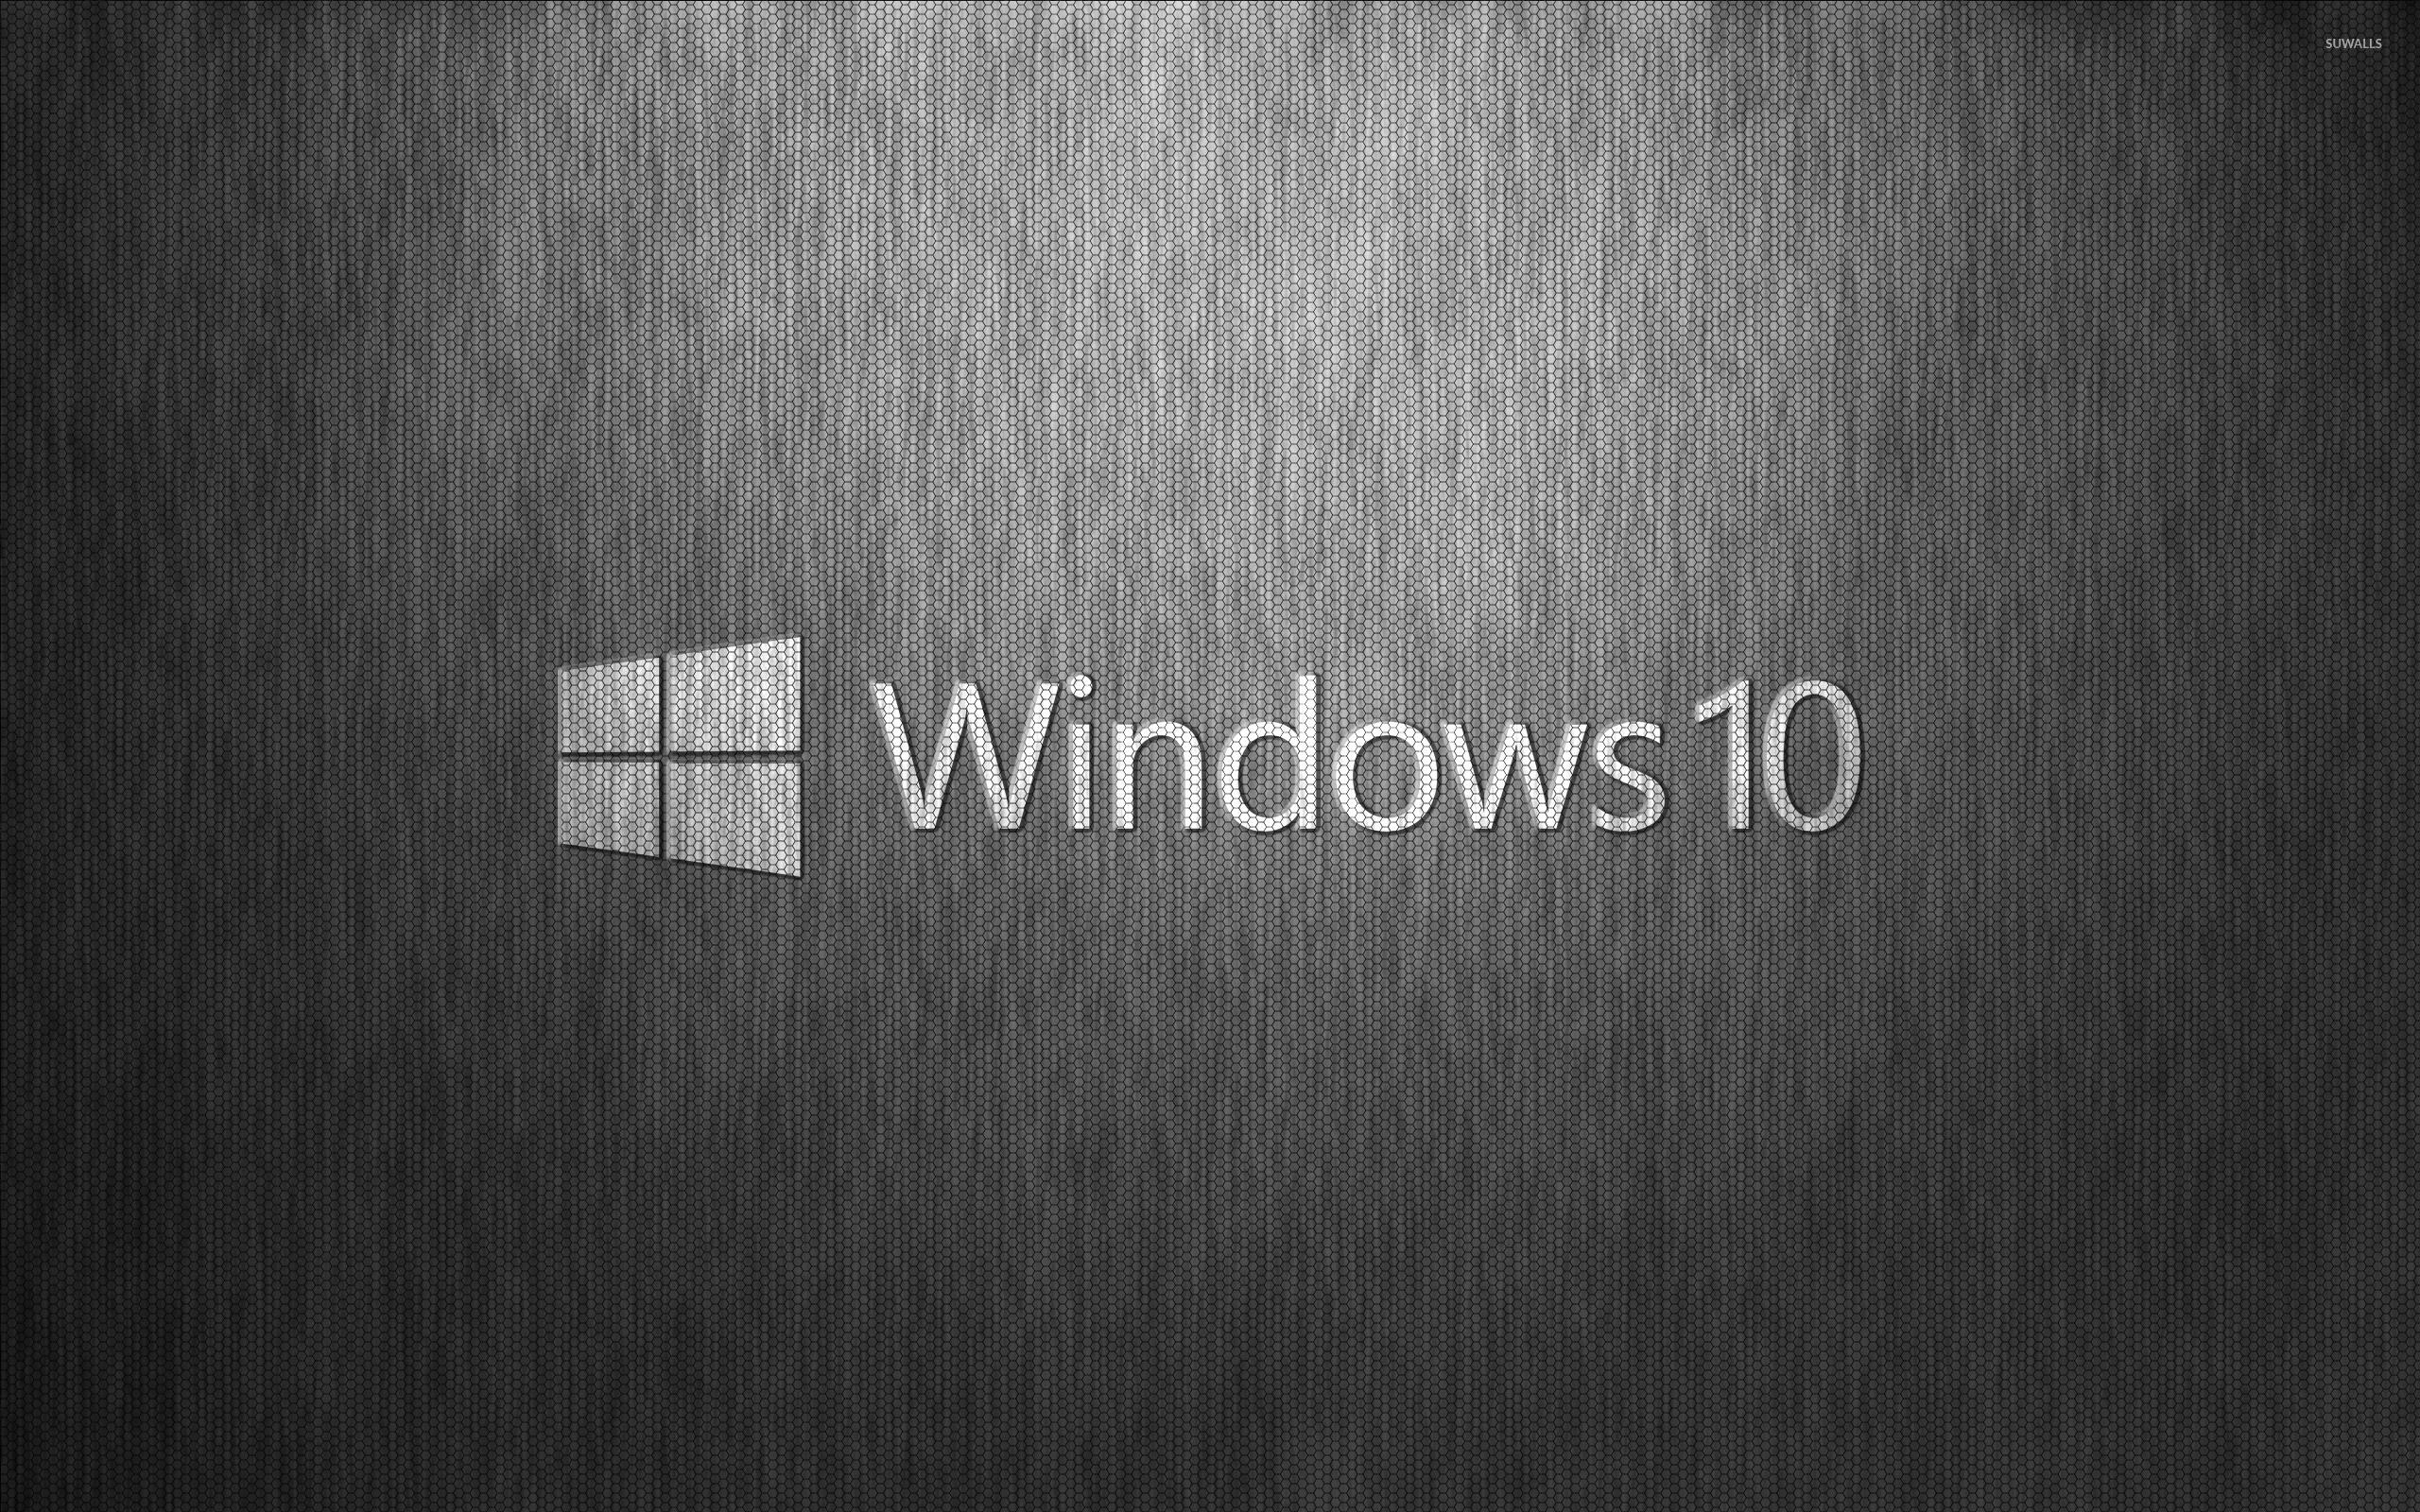 Windows 10 wallpaper - Computer wallpapers - #45263